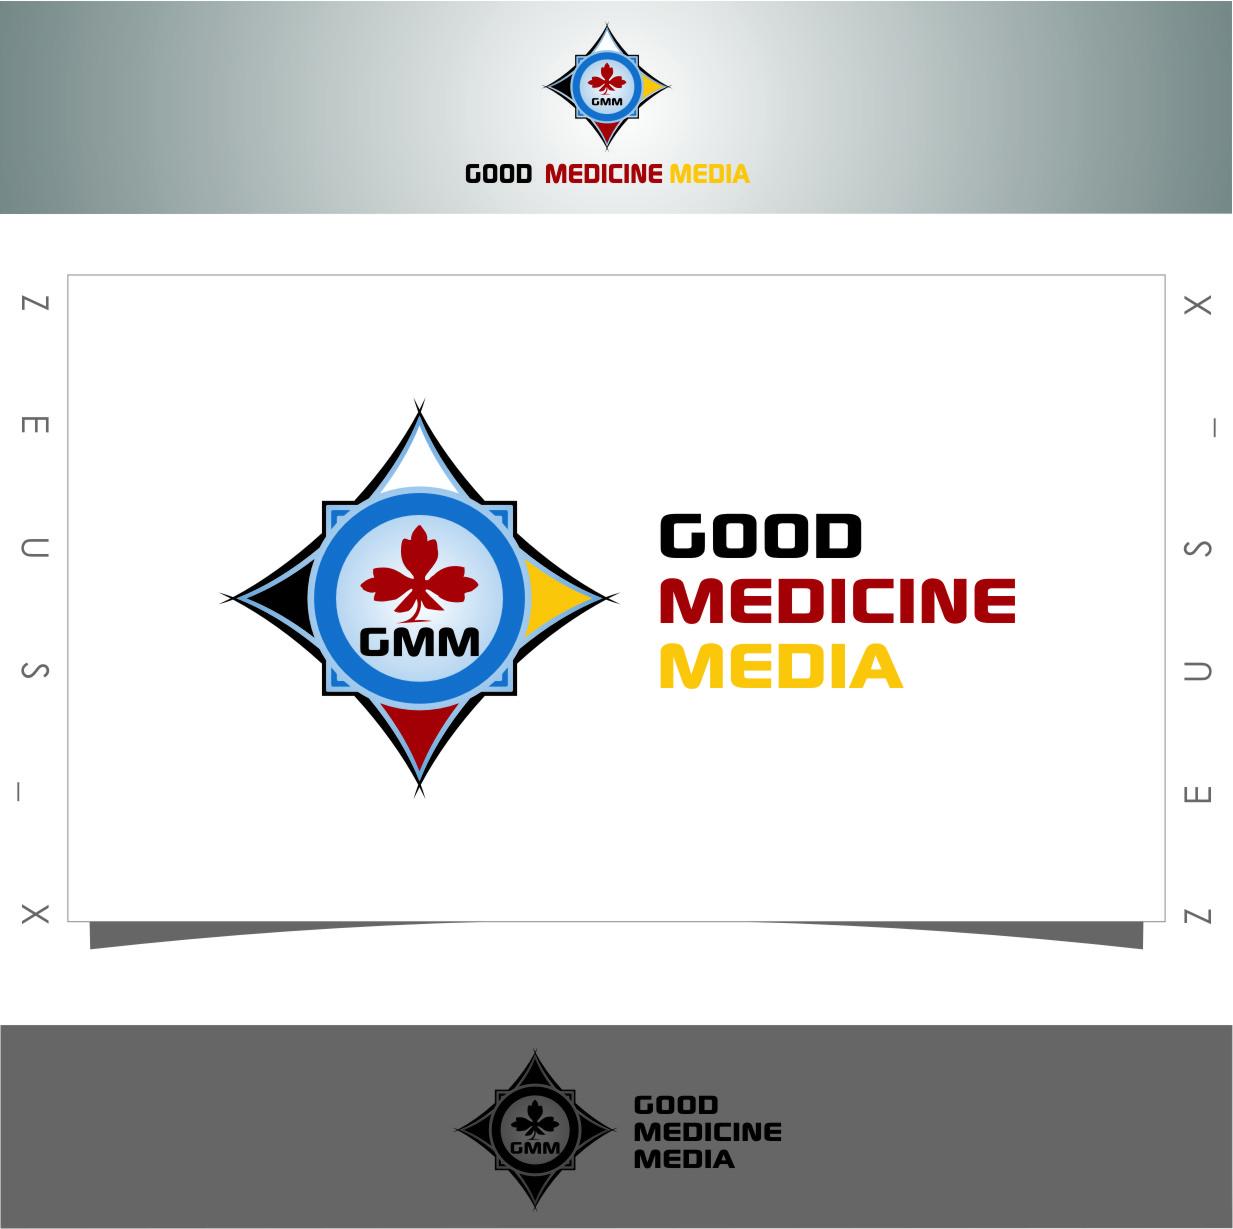 Logo Design by Ngepet_art - Entry No. 94 in the Logo Design Contest Good Medicine Media Logo Design.